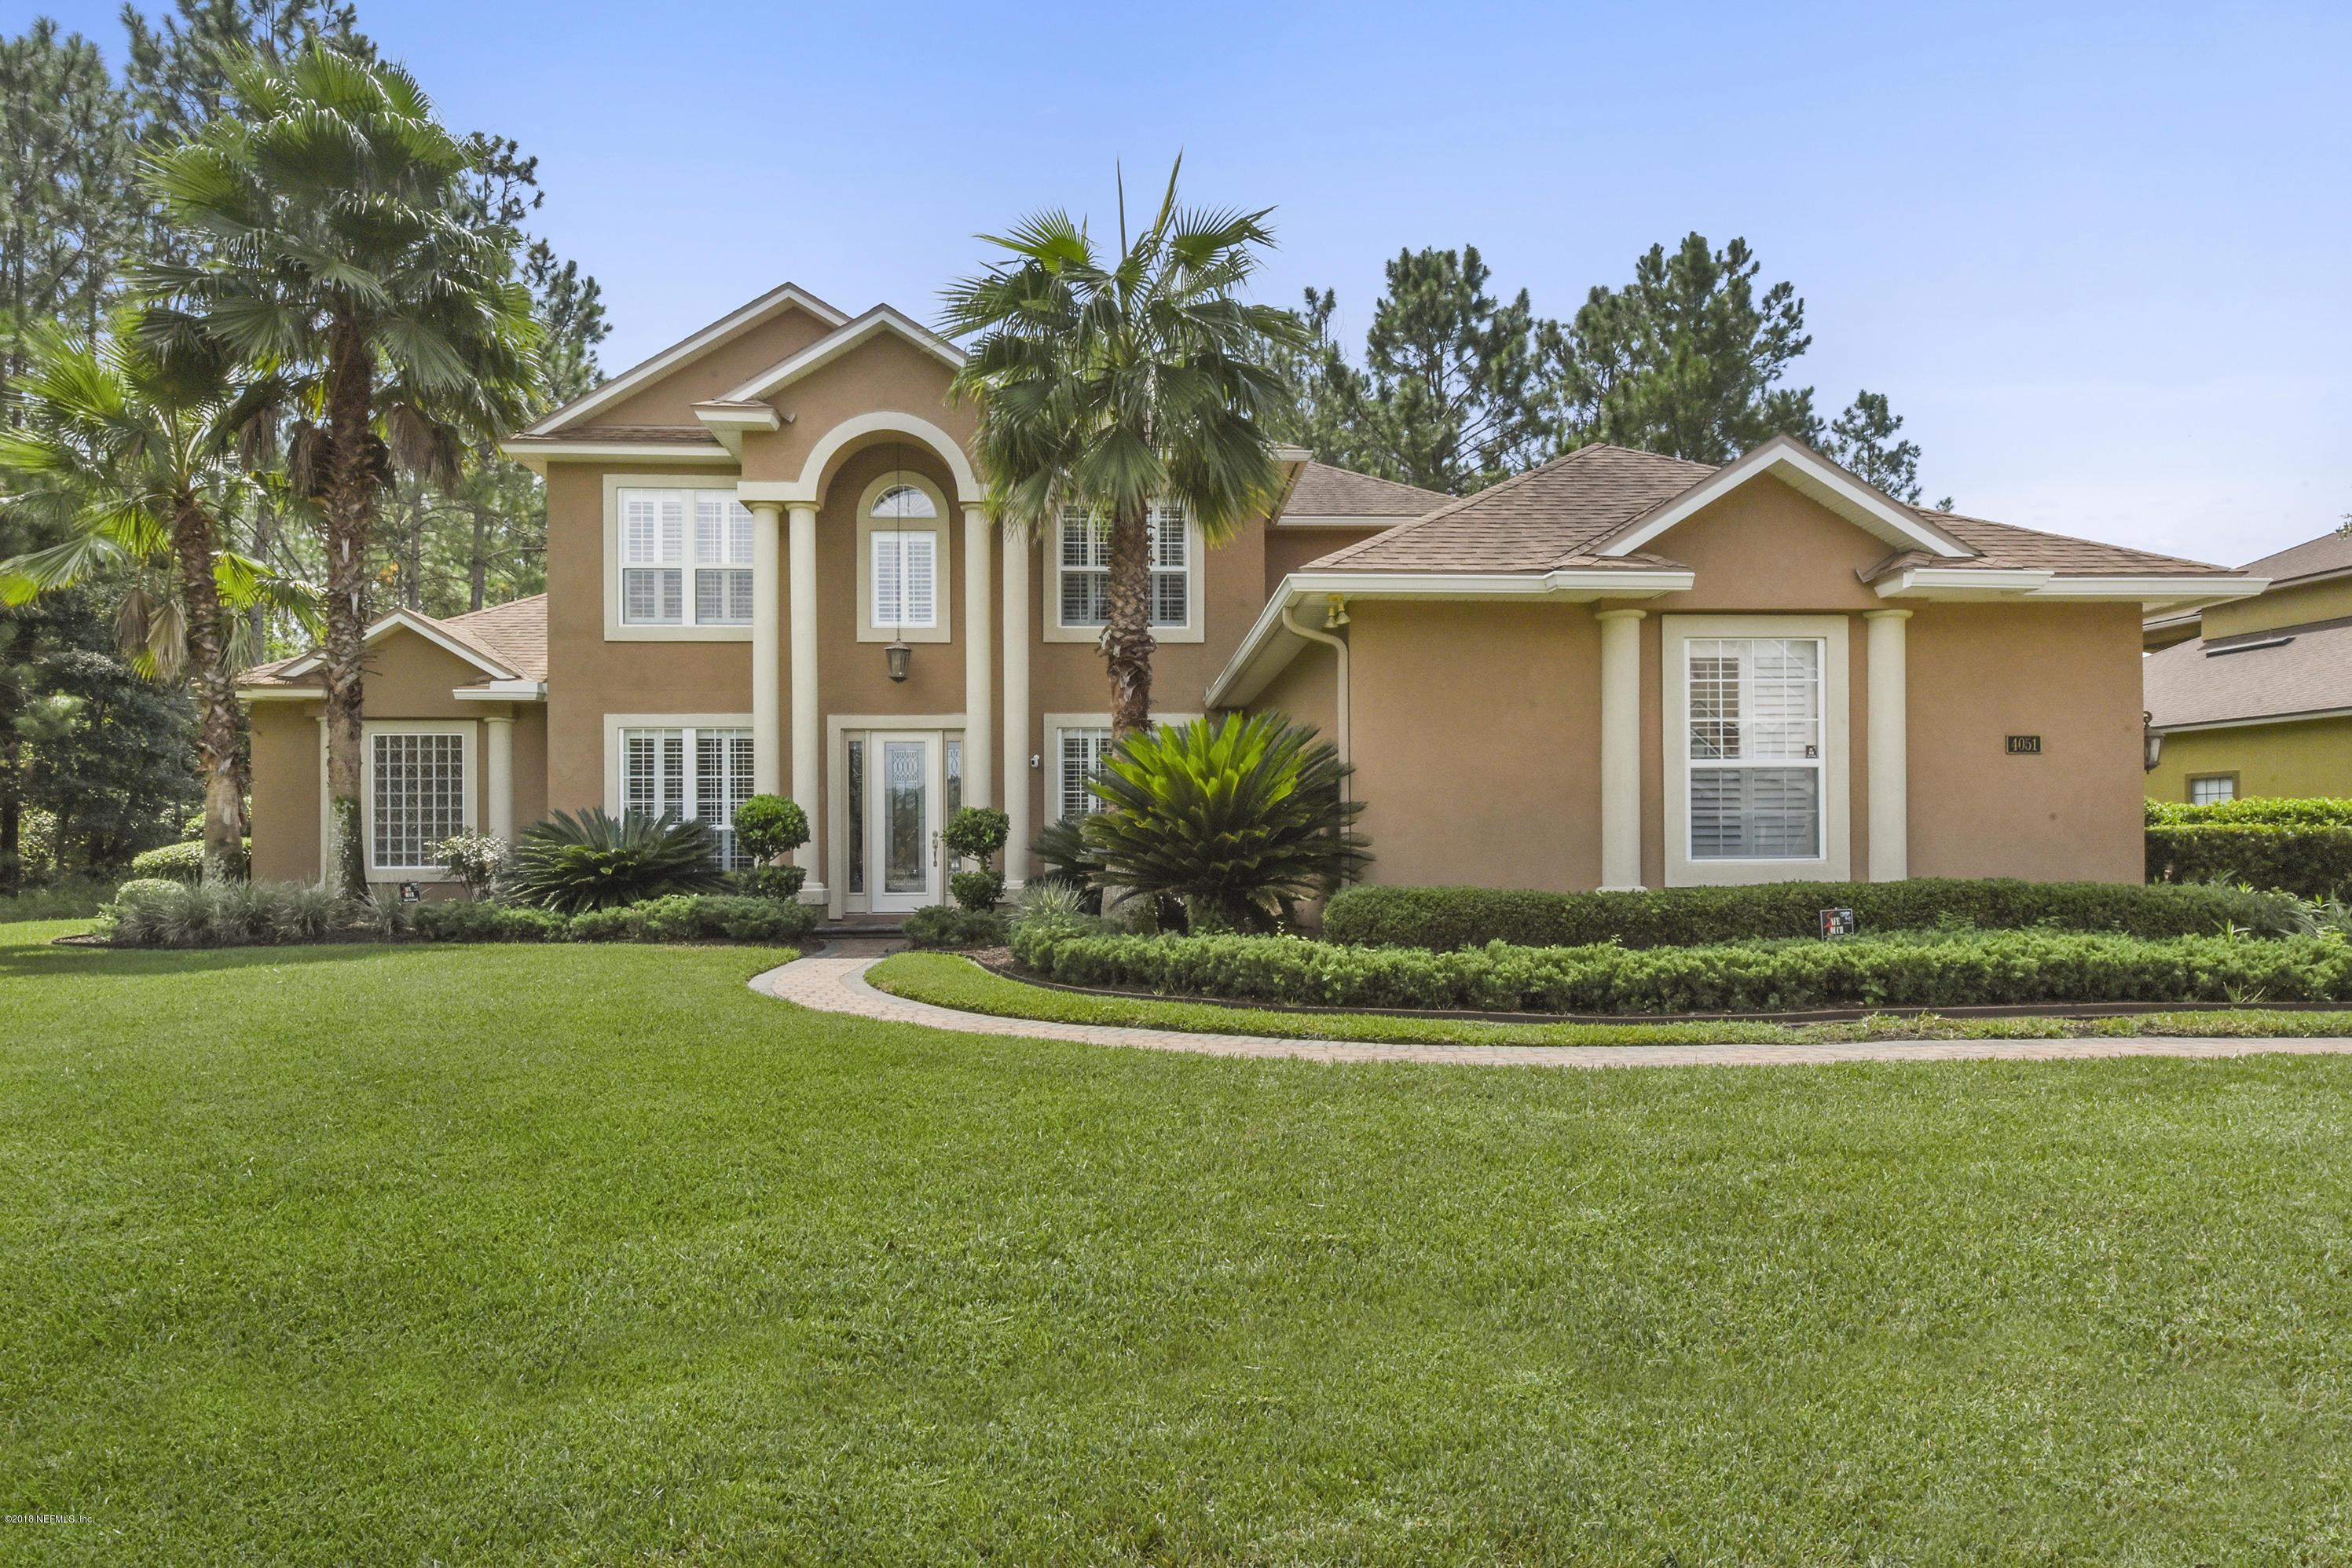 4051 EAGLE LANDING, ORANGE PARK, FLORIDA 32065, 5 Bedrooms Bedrooms, ,4 BathroomsBathrooms,Residential - single family,For sale,EAGLE LANDING,955075